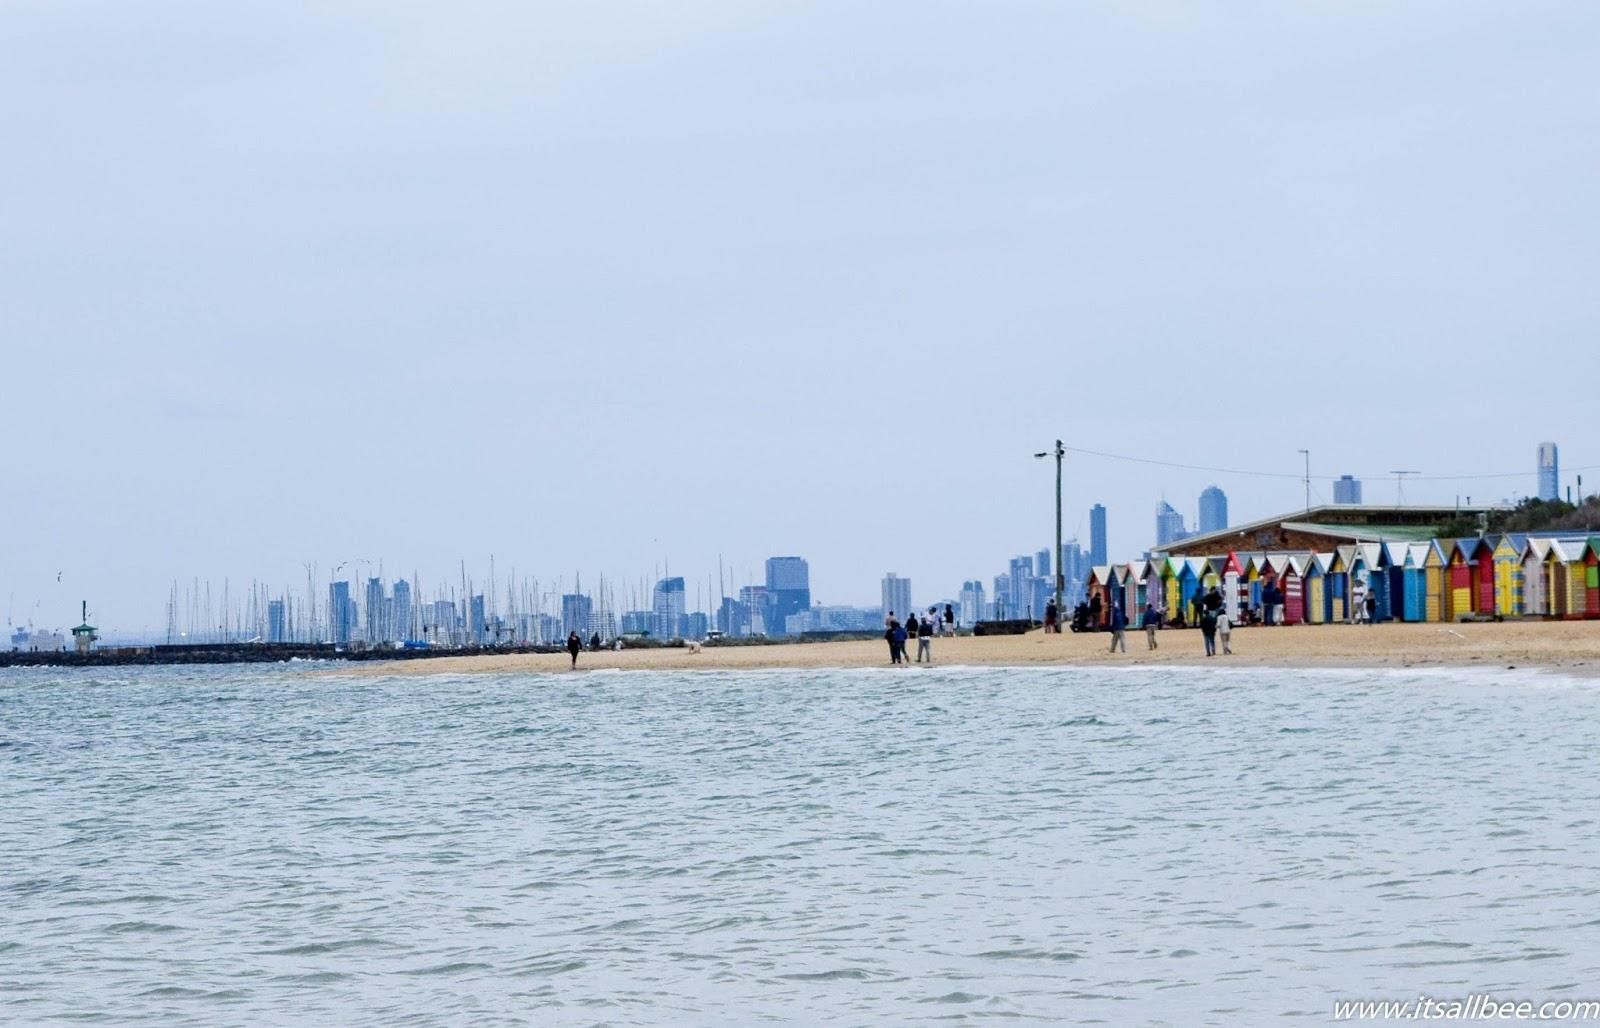 How To Get To Brighton Beach Melbourne's Bathing Boxes Beach #itsallbee #australia #traveltips #beaches #ocean #vacation #takemethere #beachlife